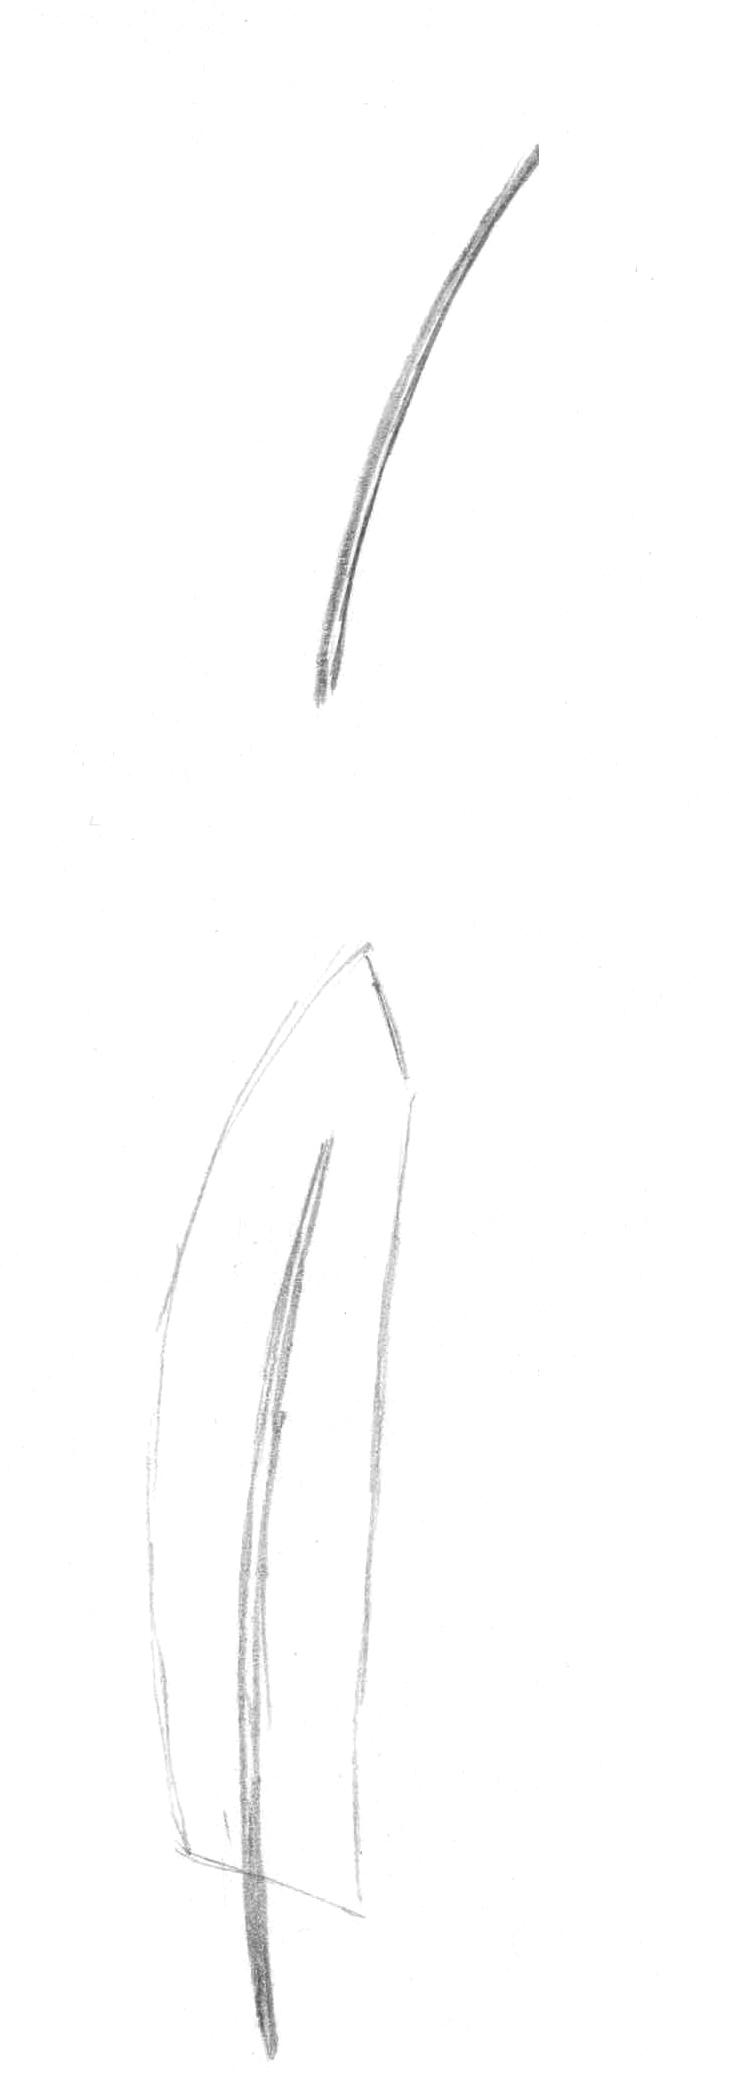 Рисуем перья карандашом - шаг 2